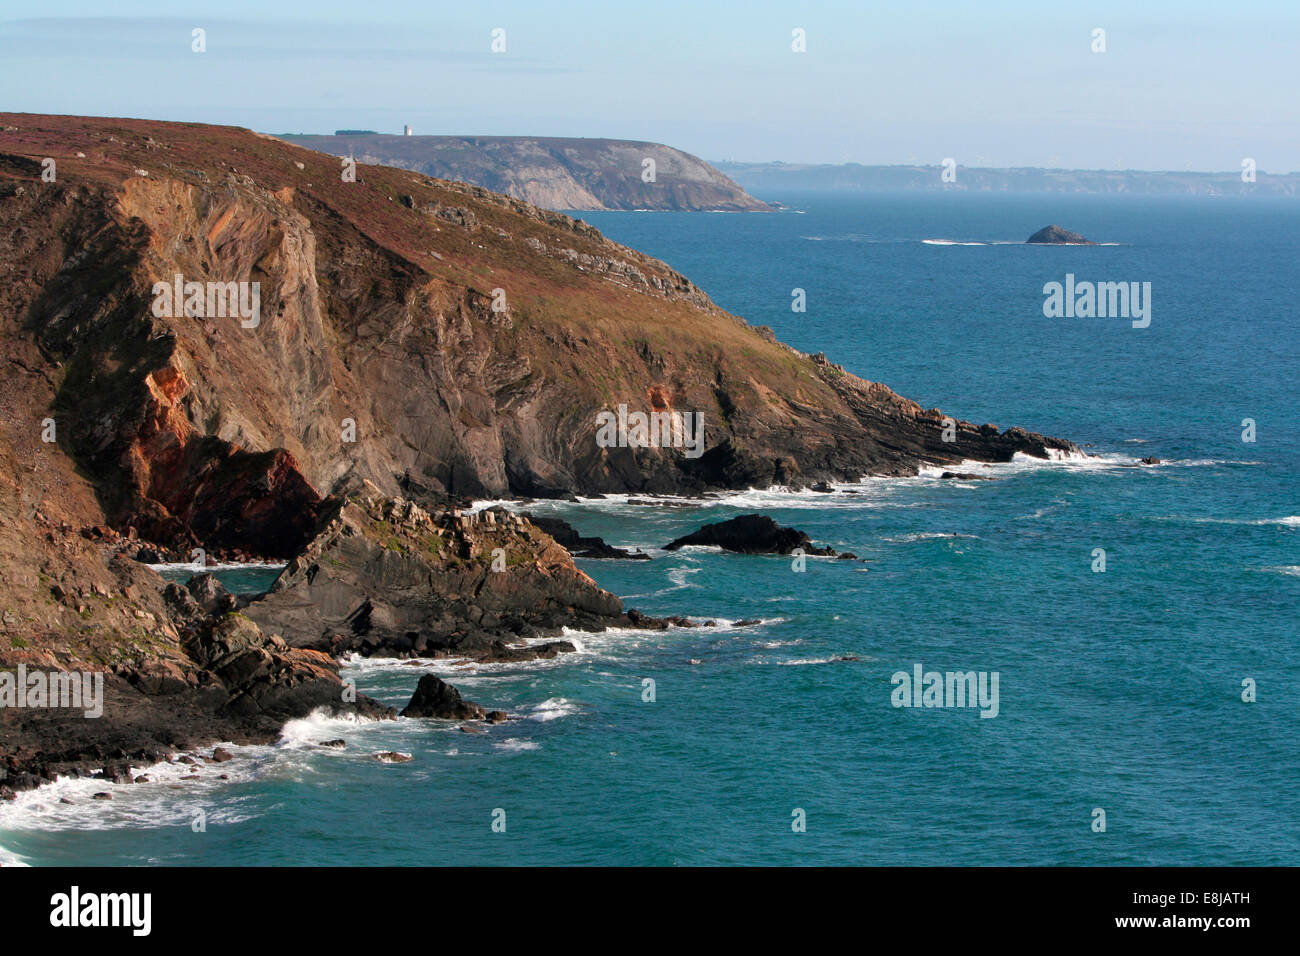 Finistre coastline - Stock Image